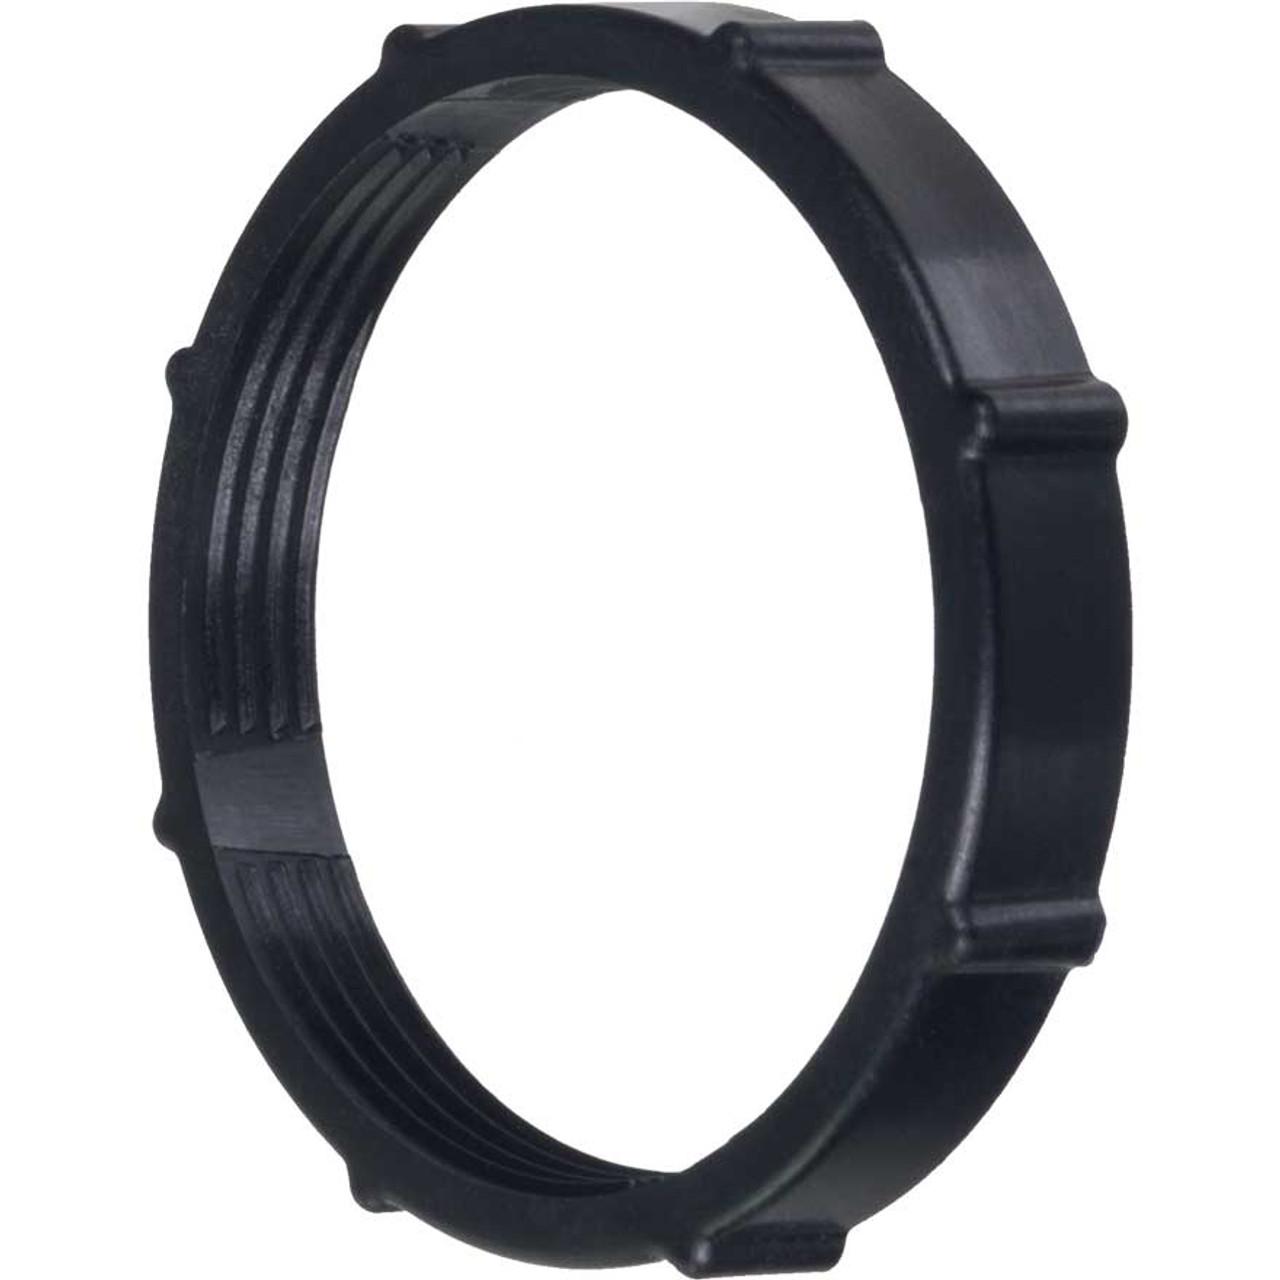 "Spin Lock Ring for 2 1/16"" & 2 5/8"" Gauges"